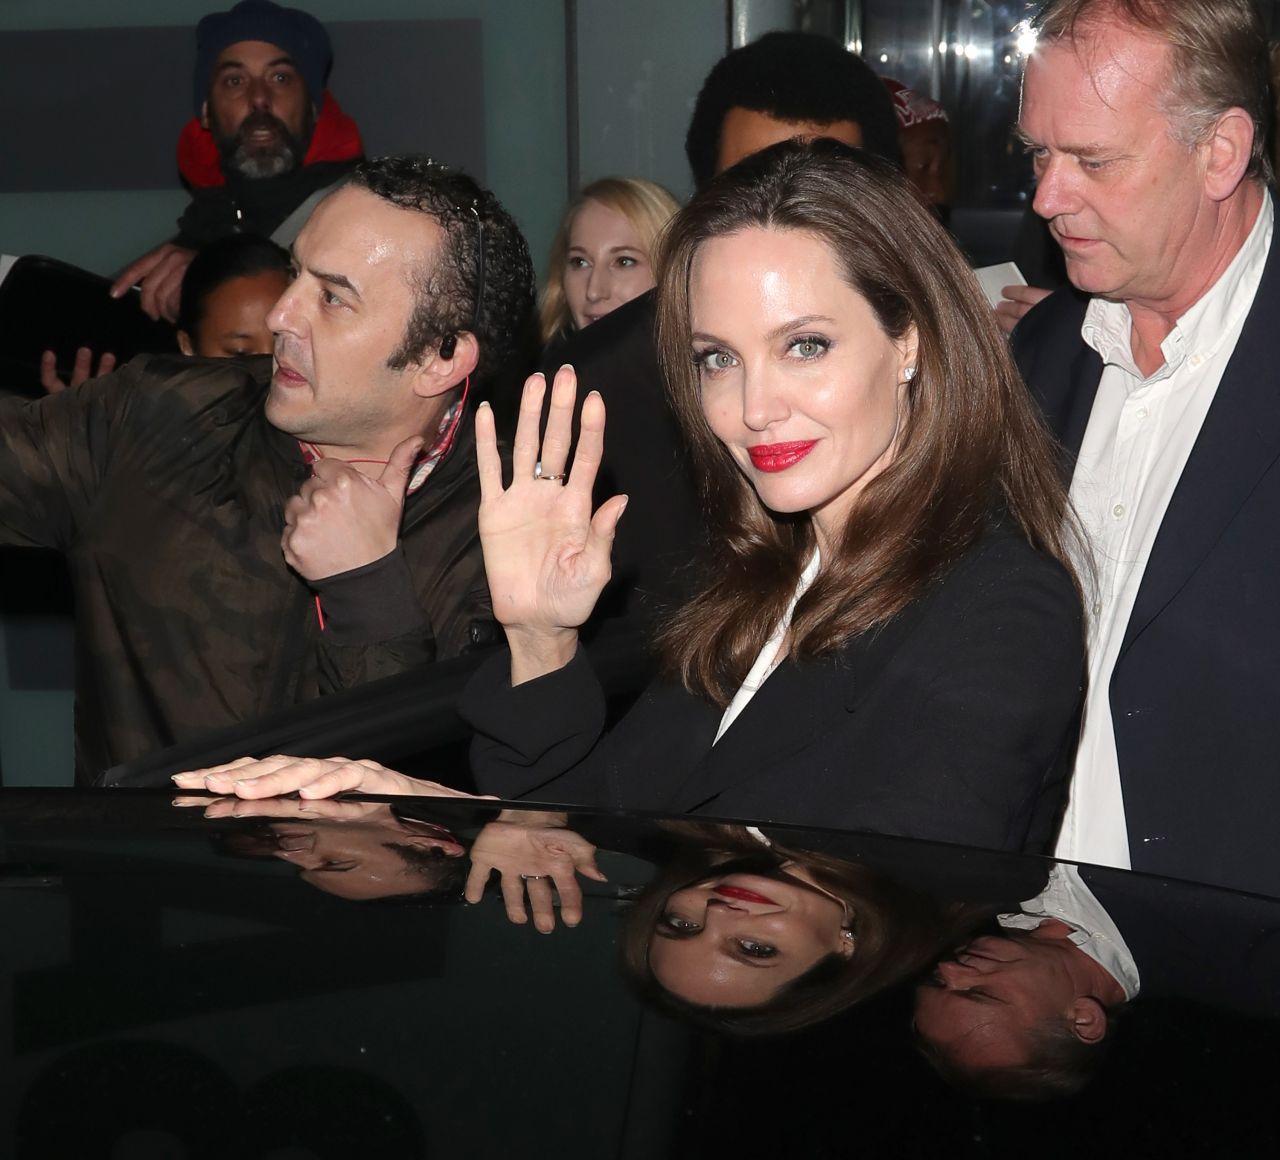 https://celebmafia.com/wp-content/uploads/2018/11/angelina-jolie-leaving-the-british-film-institut-in-london-11-23-2018-11.jpg